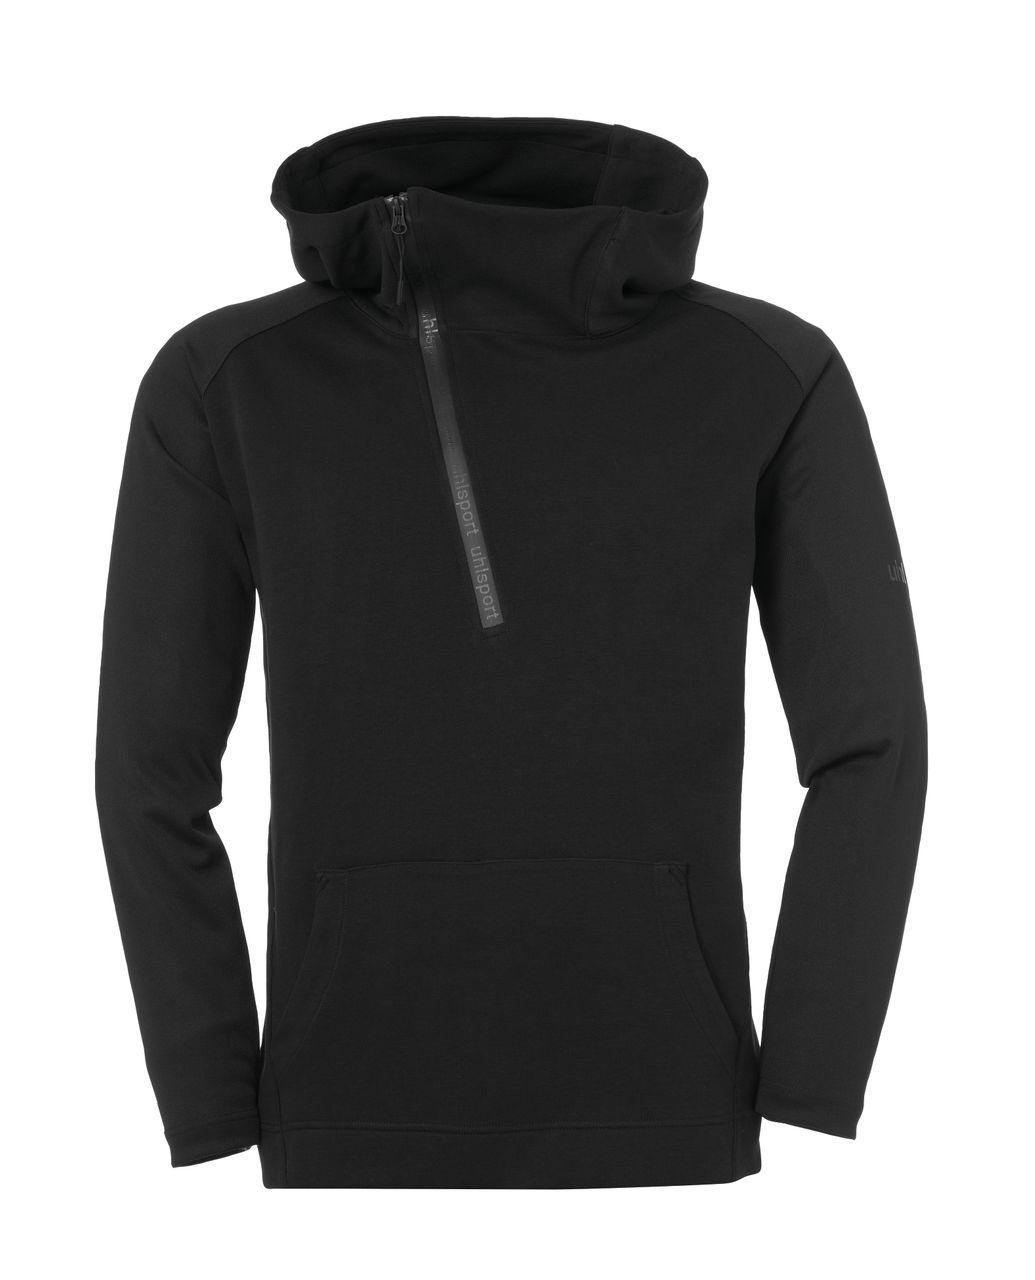 Uhlsport ESSENTIAL PRO hooded sweatshirt with zip